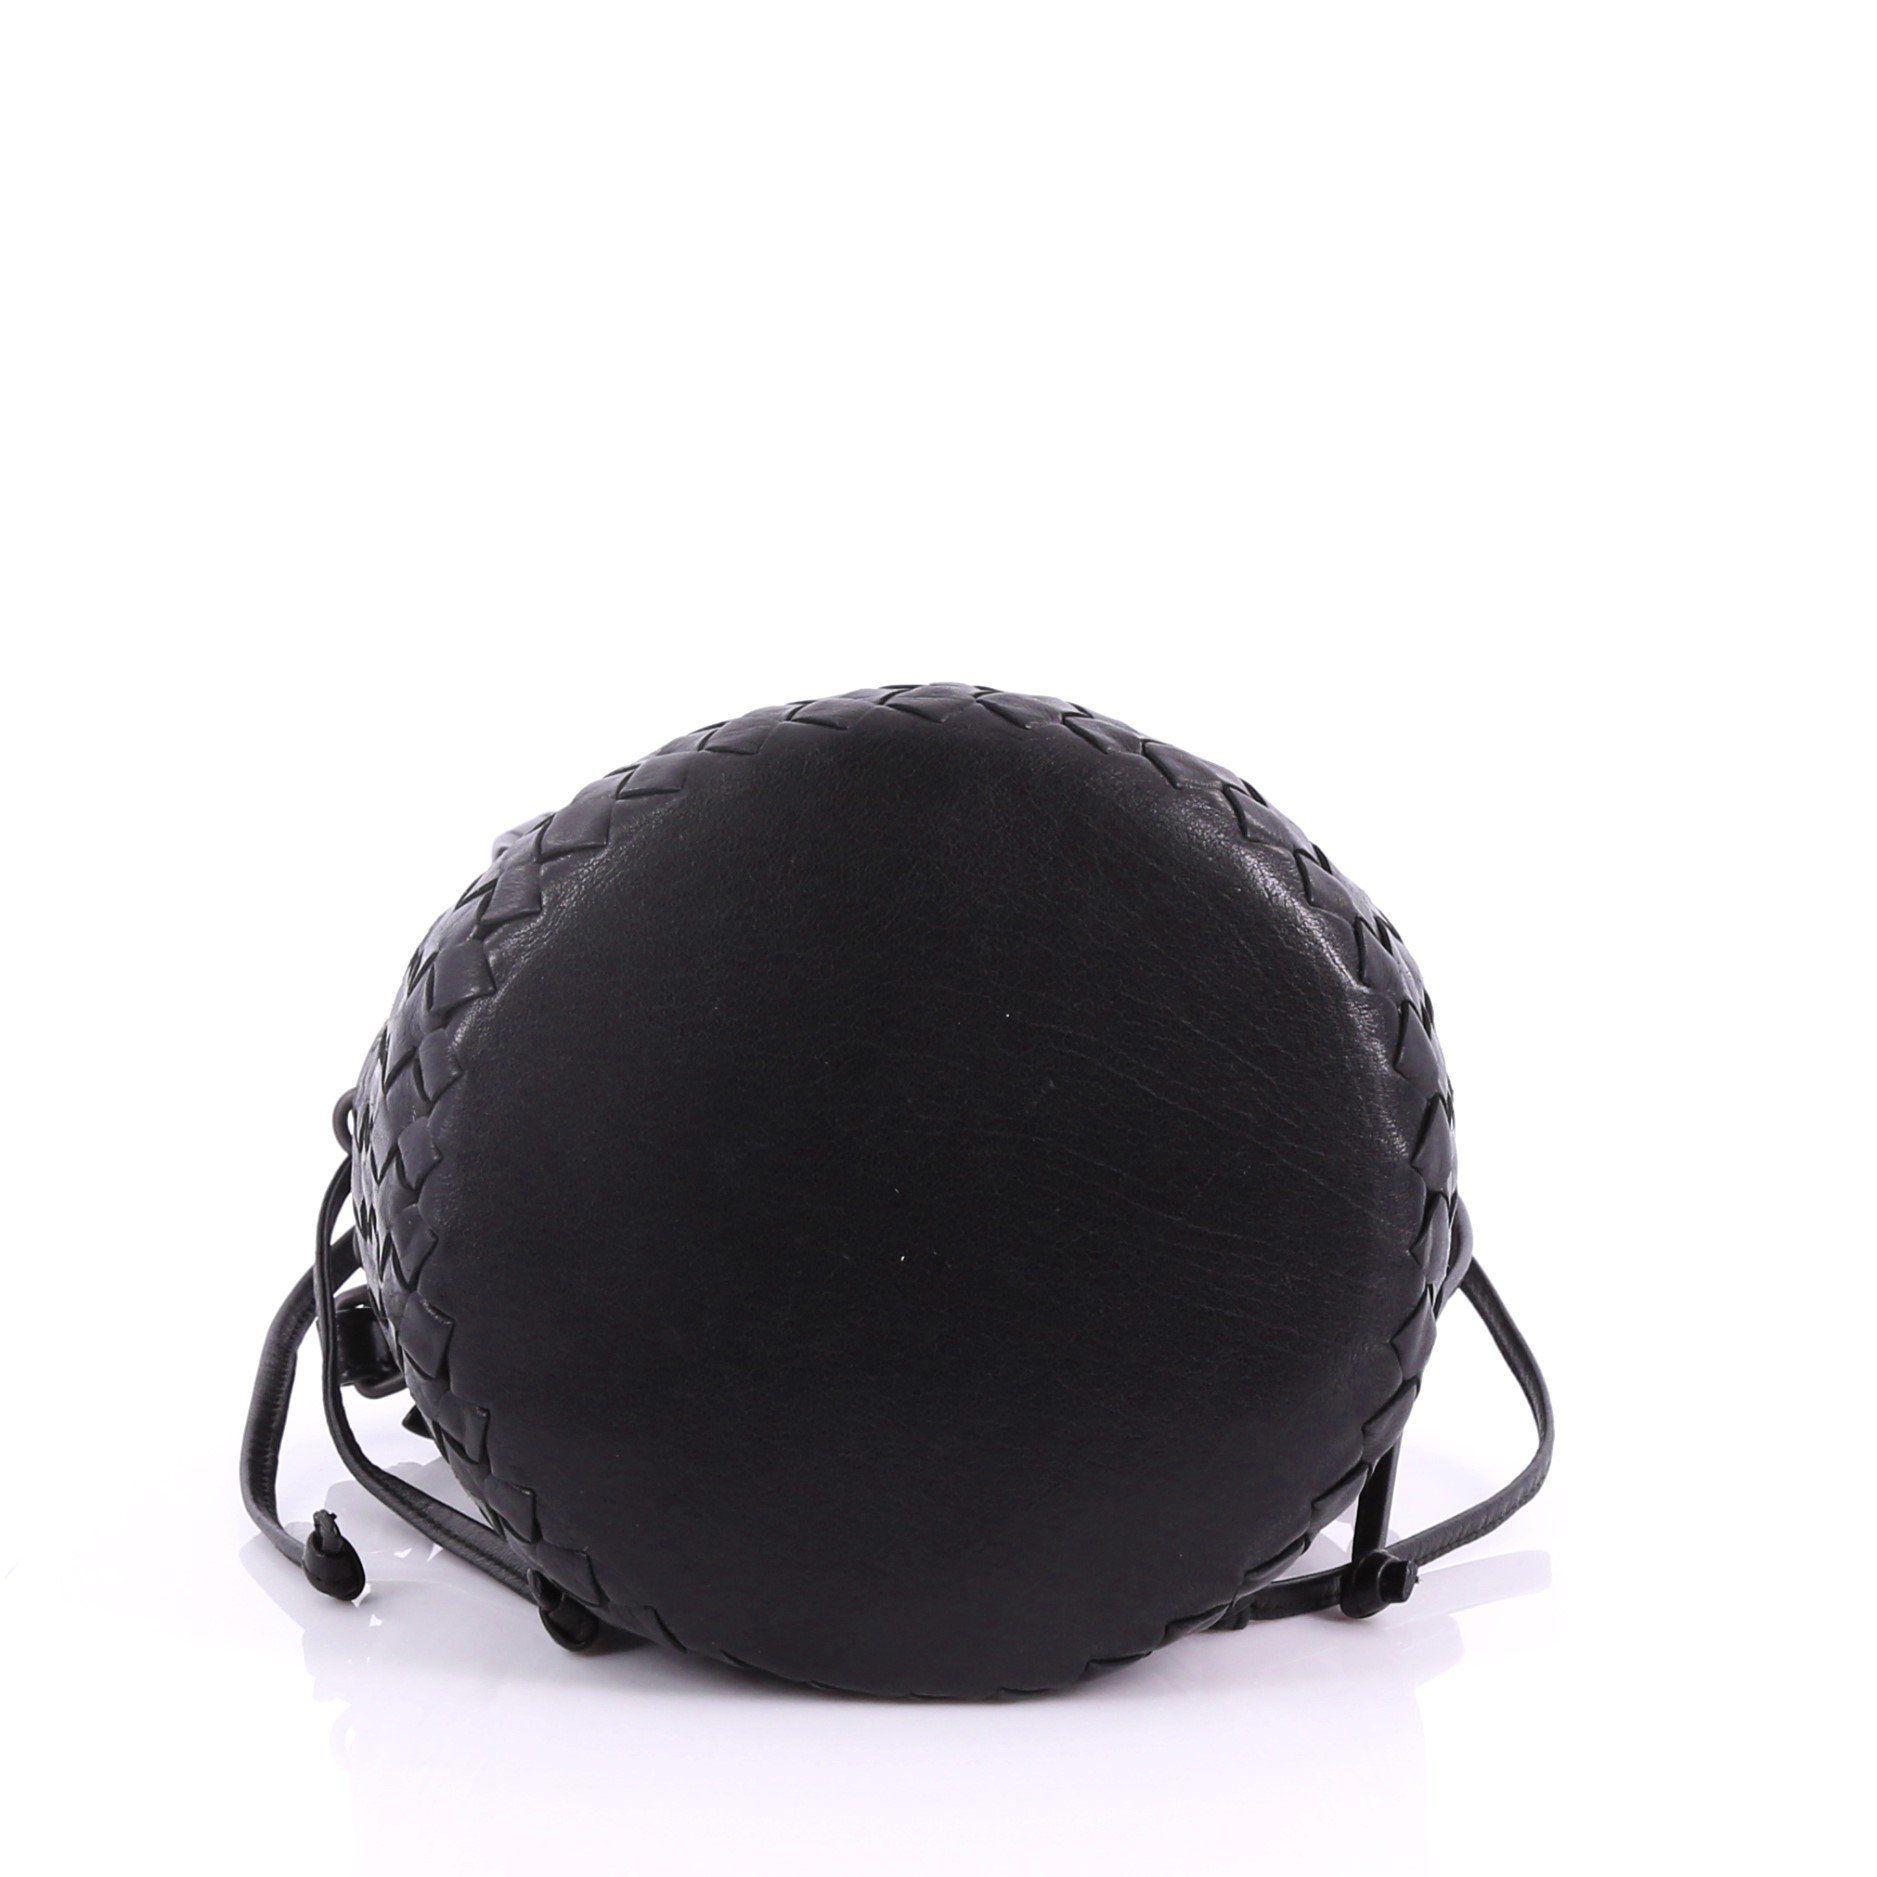 6e94a3cf1601 Bottega Veneta - Black Pre Owned Drawstring Bucket Bag Leather And Intrecciato  Nappa Small - Lyst. View fullscreen